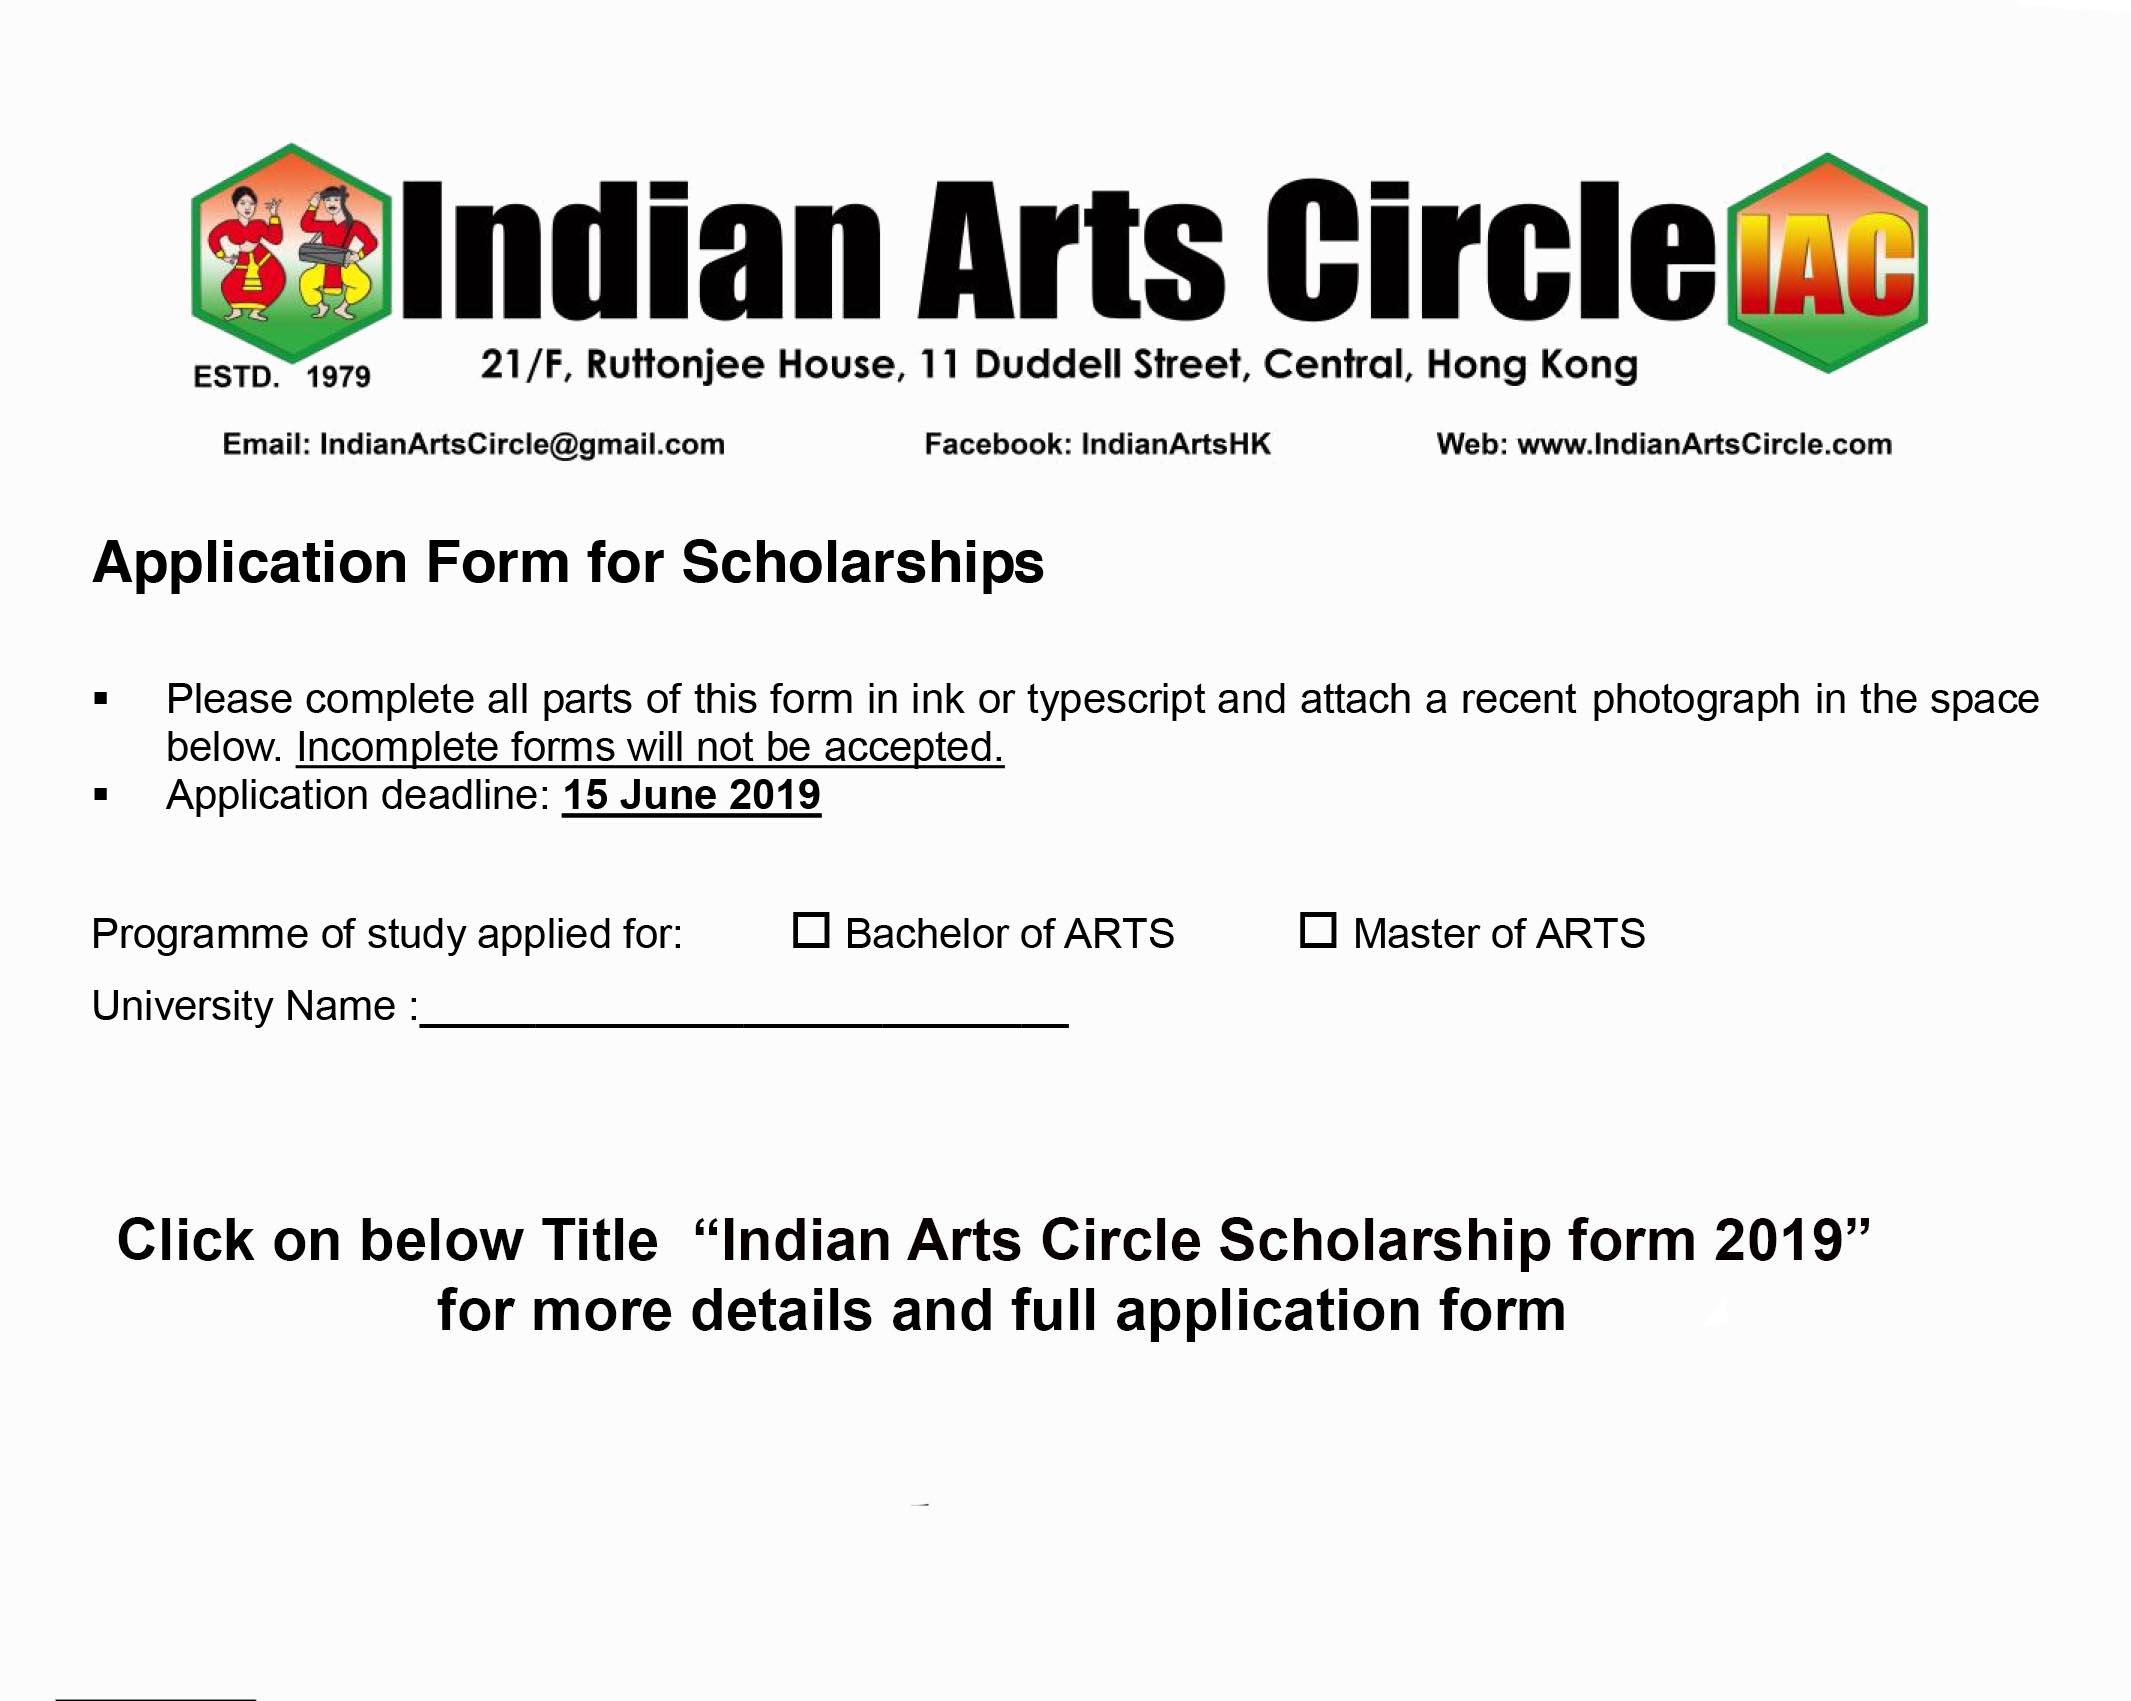 Indian Arts Circle Scholarship form 2019